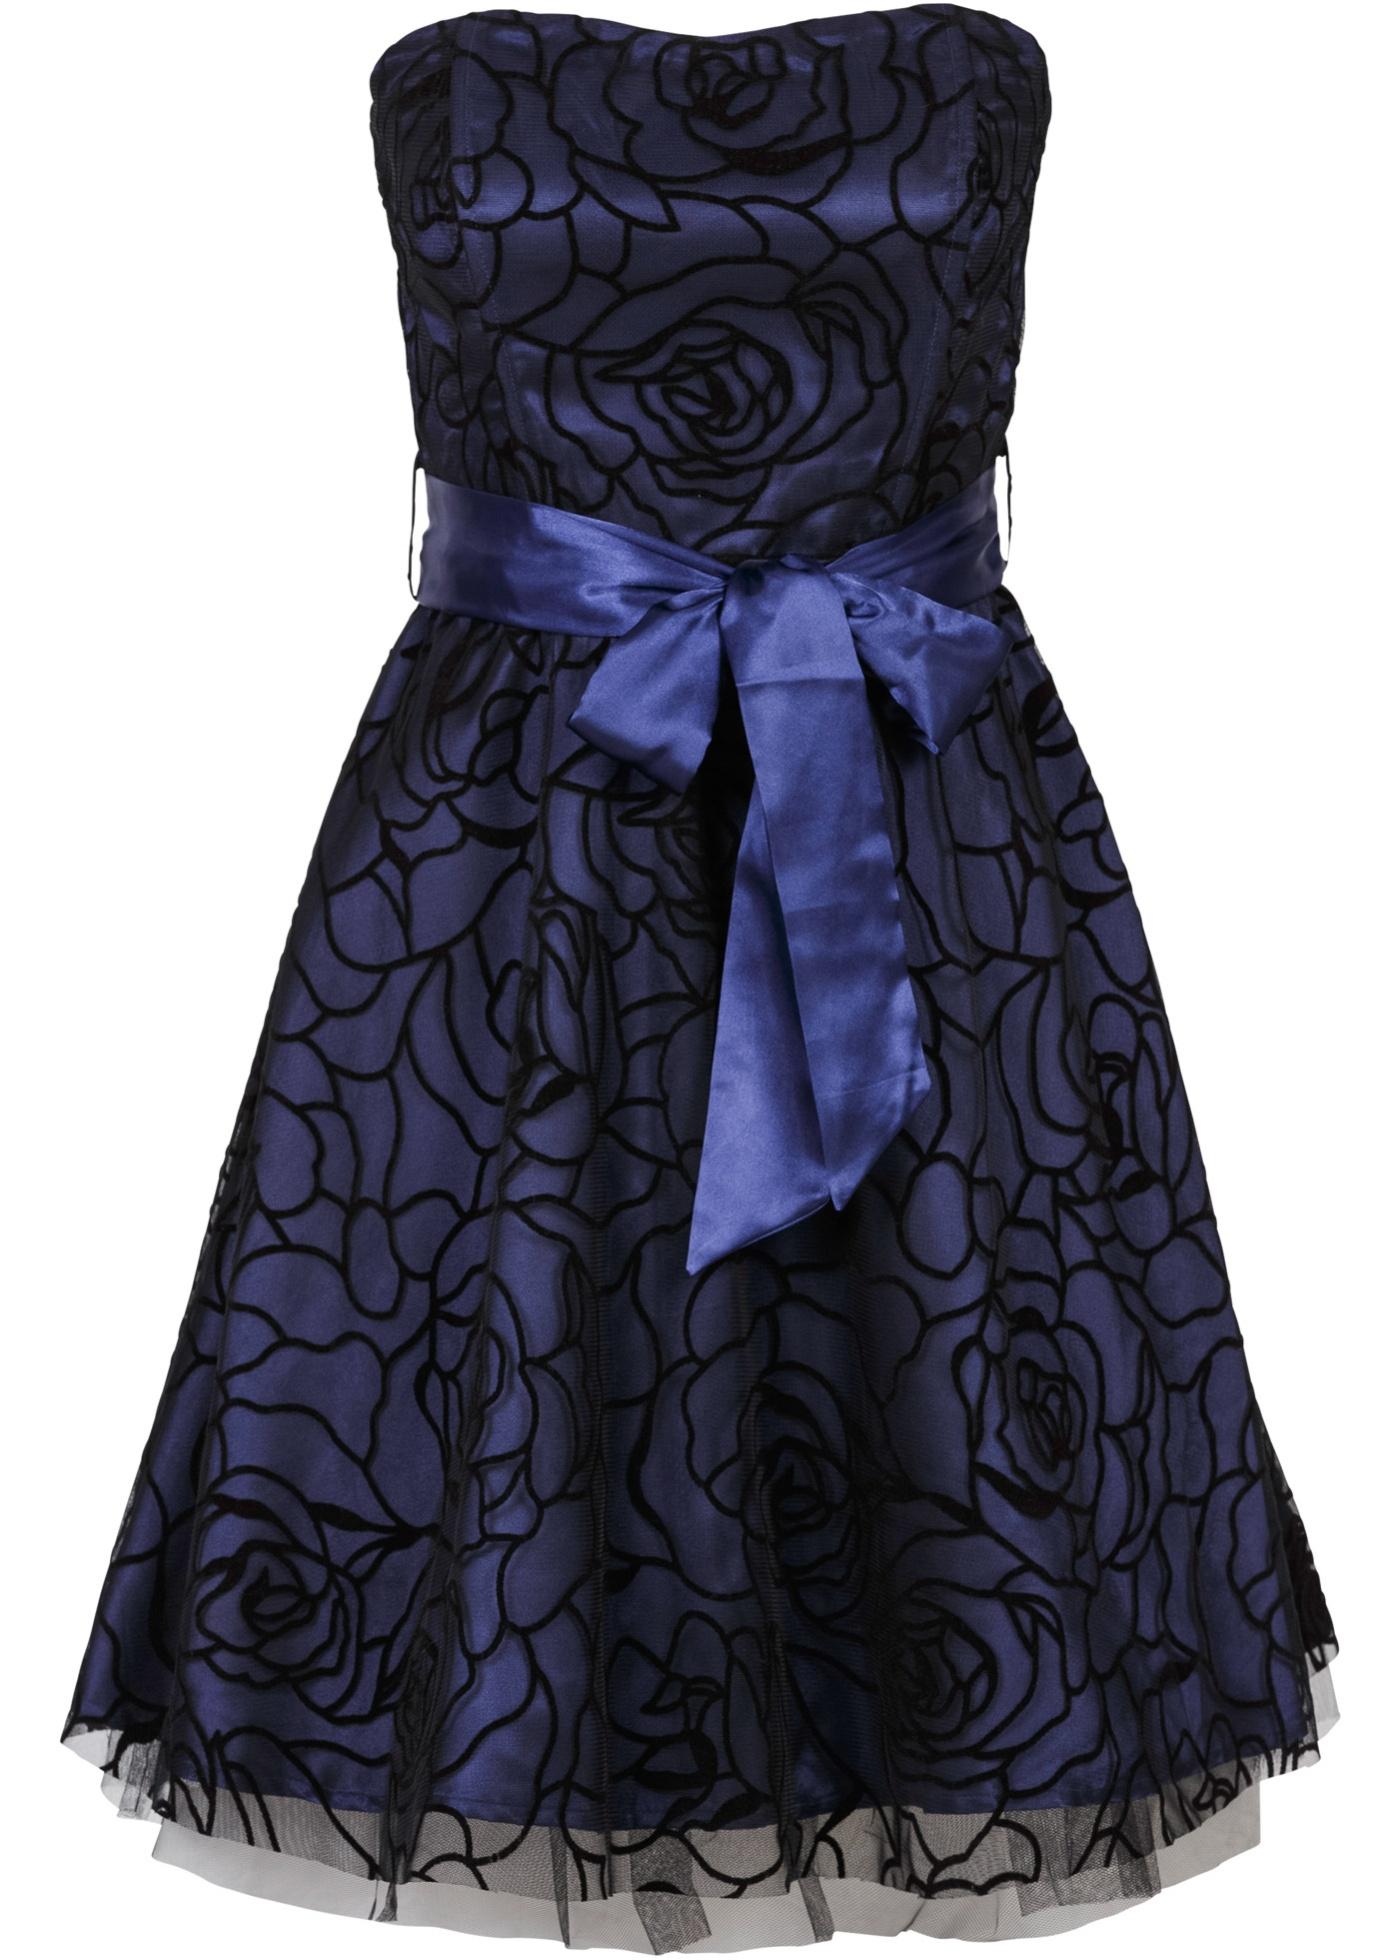 robe femme forte jusqu 75 pureshopping. Black Bedroom Furniture Sets. Home Design Ideas